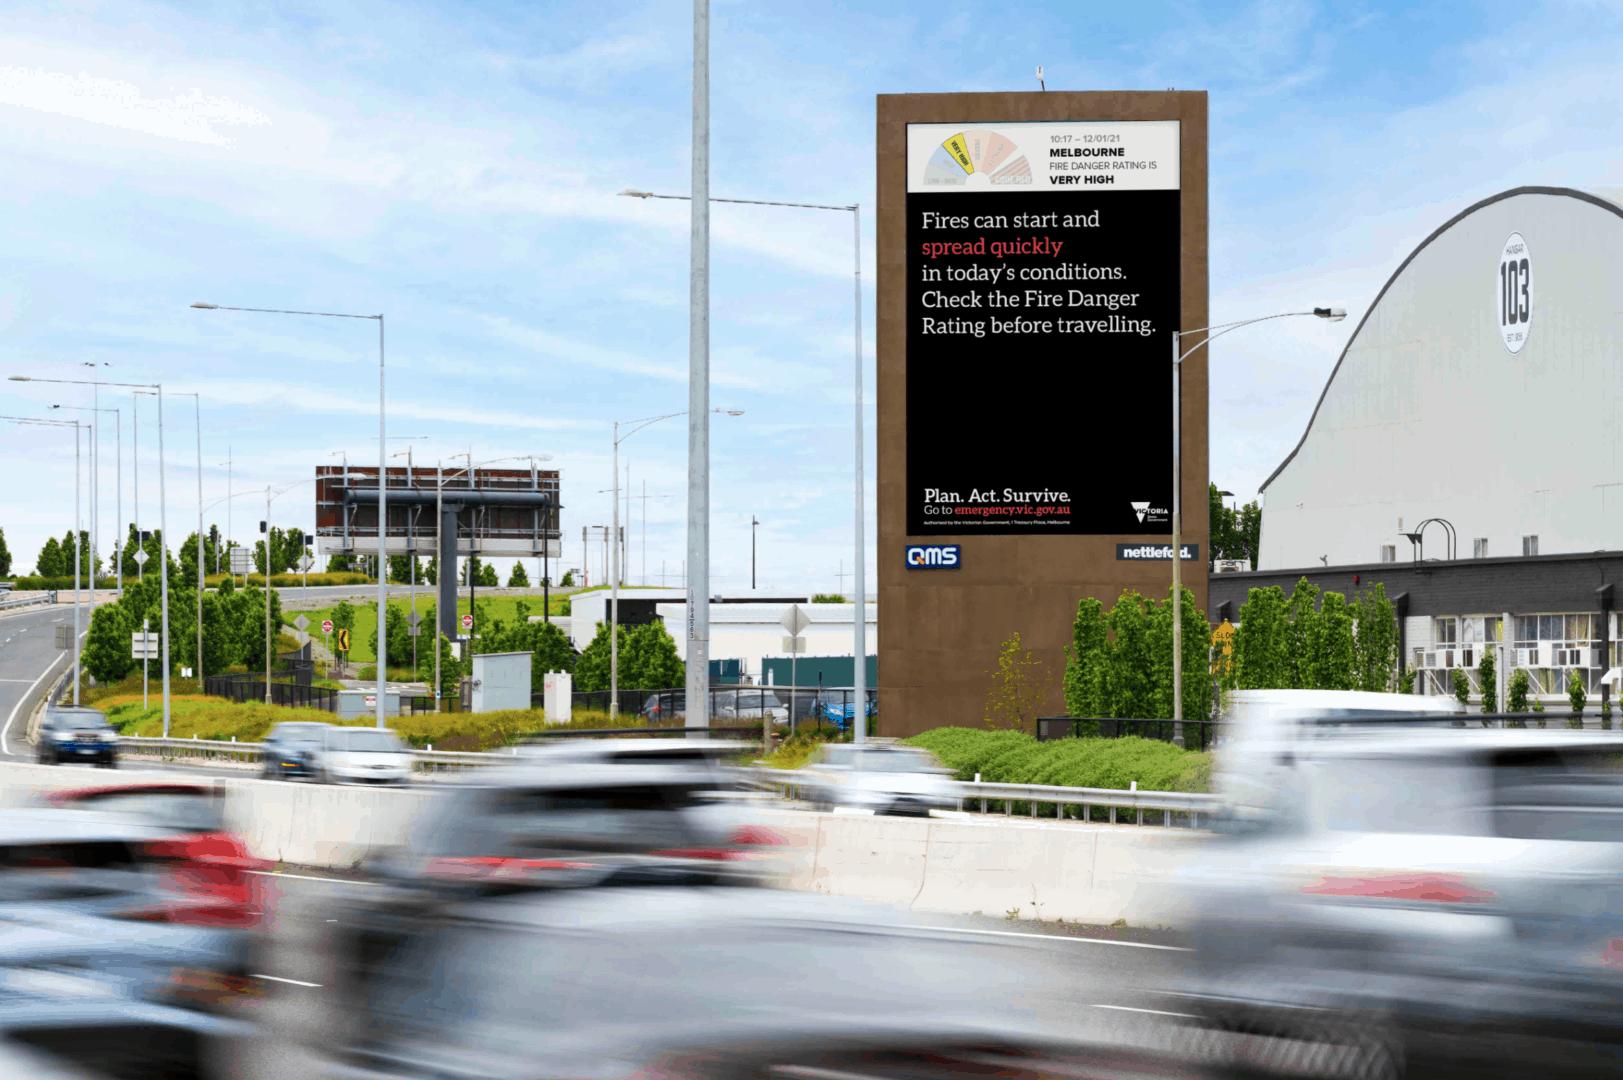 QMS fire warning billboards